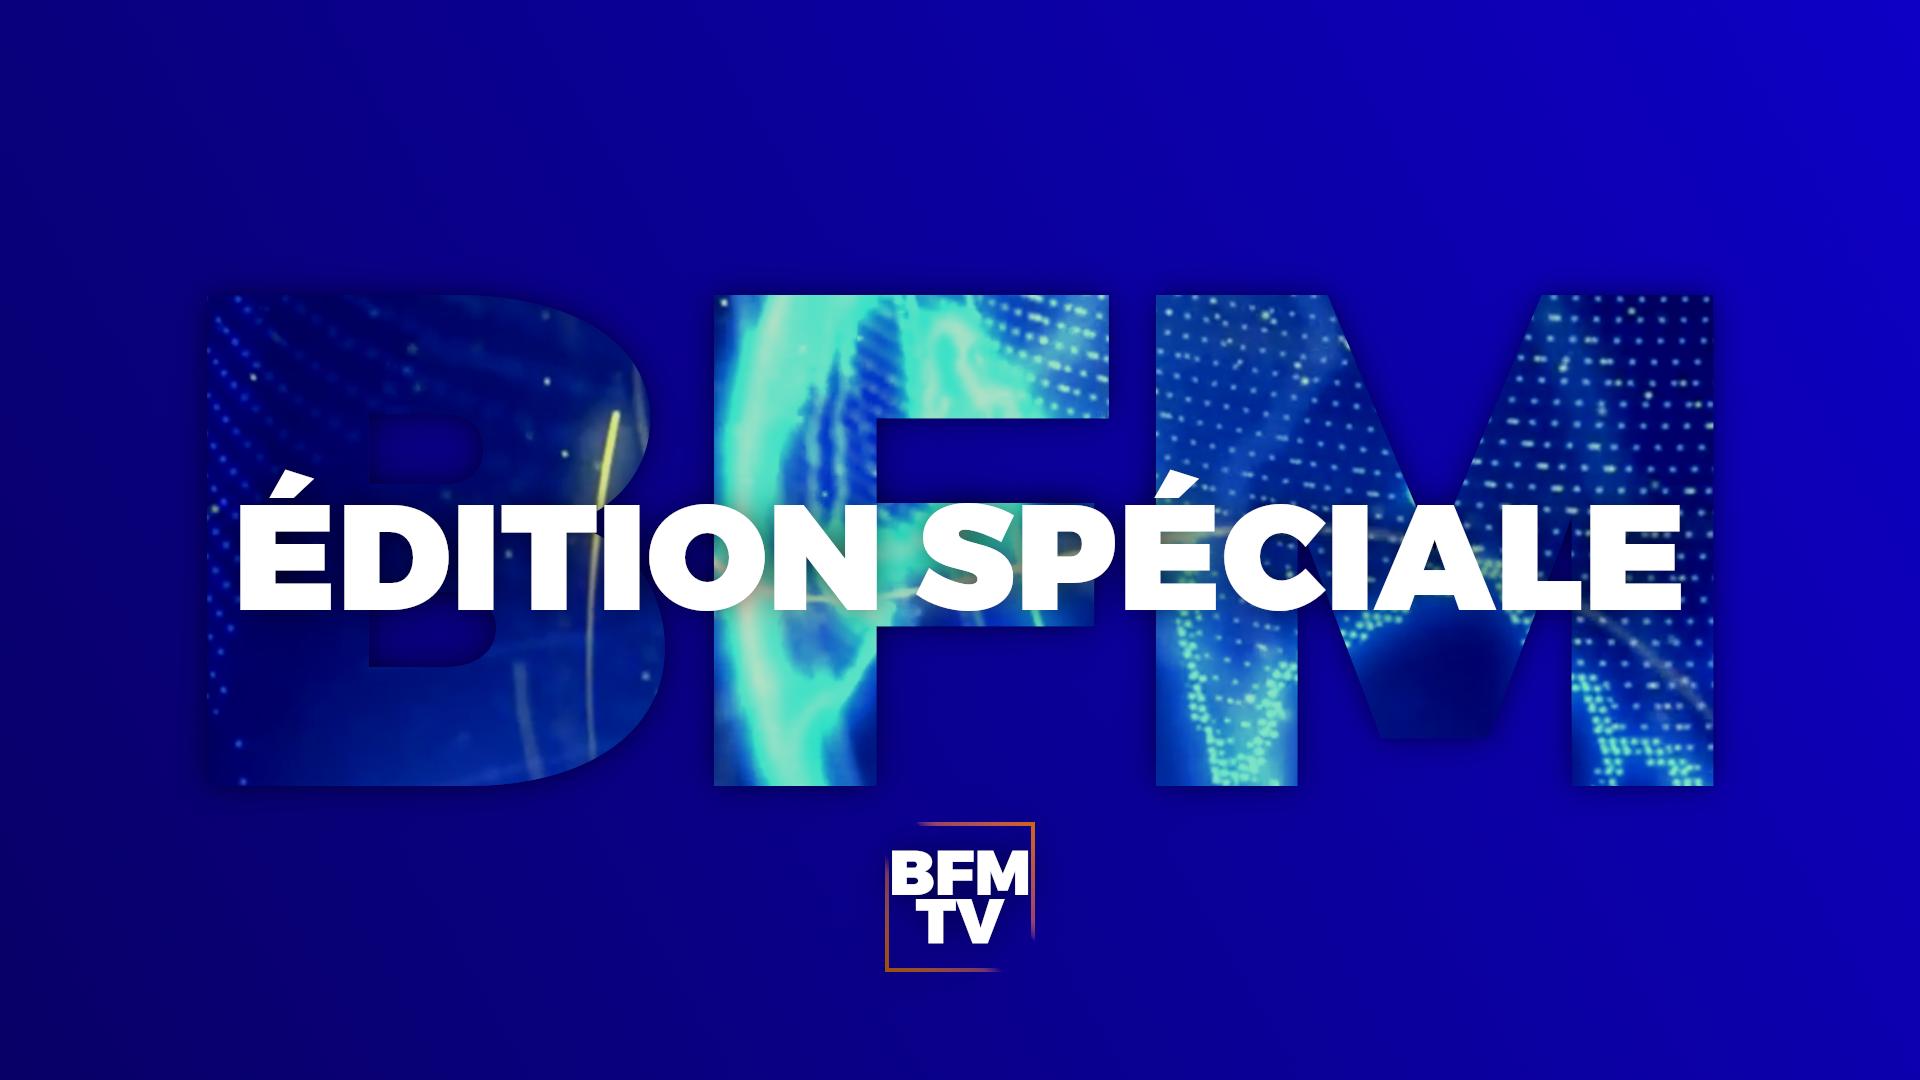 BFMTV_ES